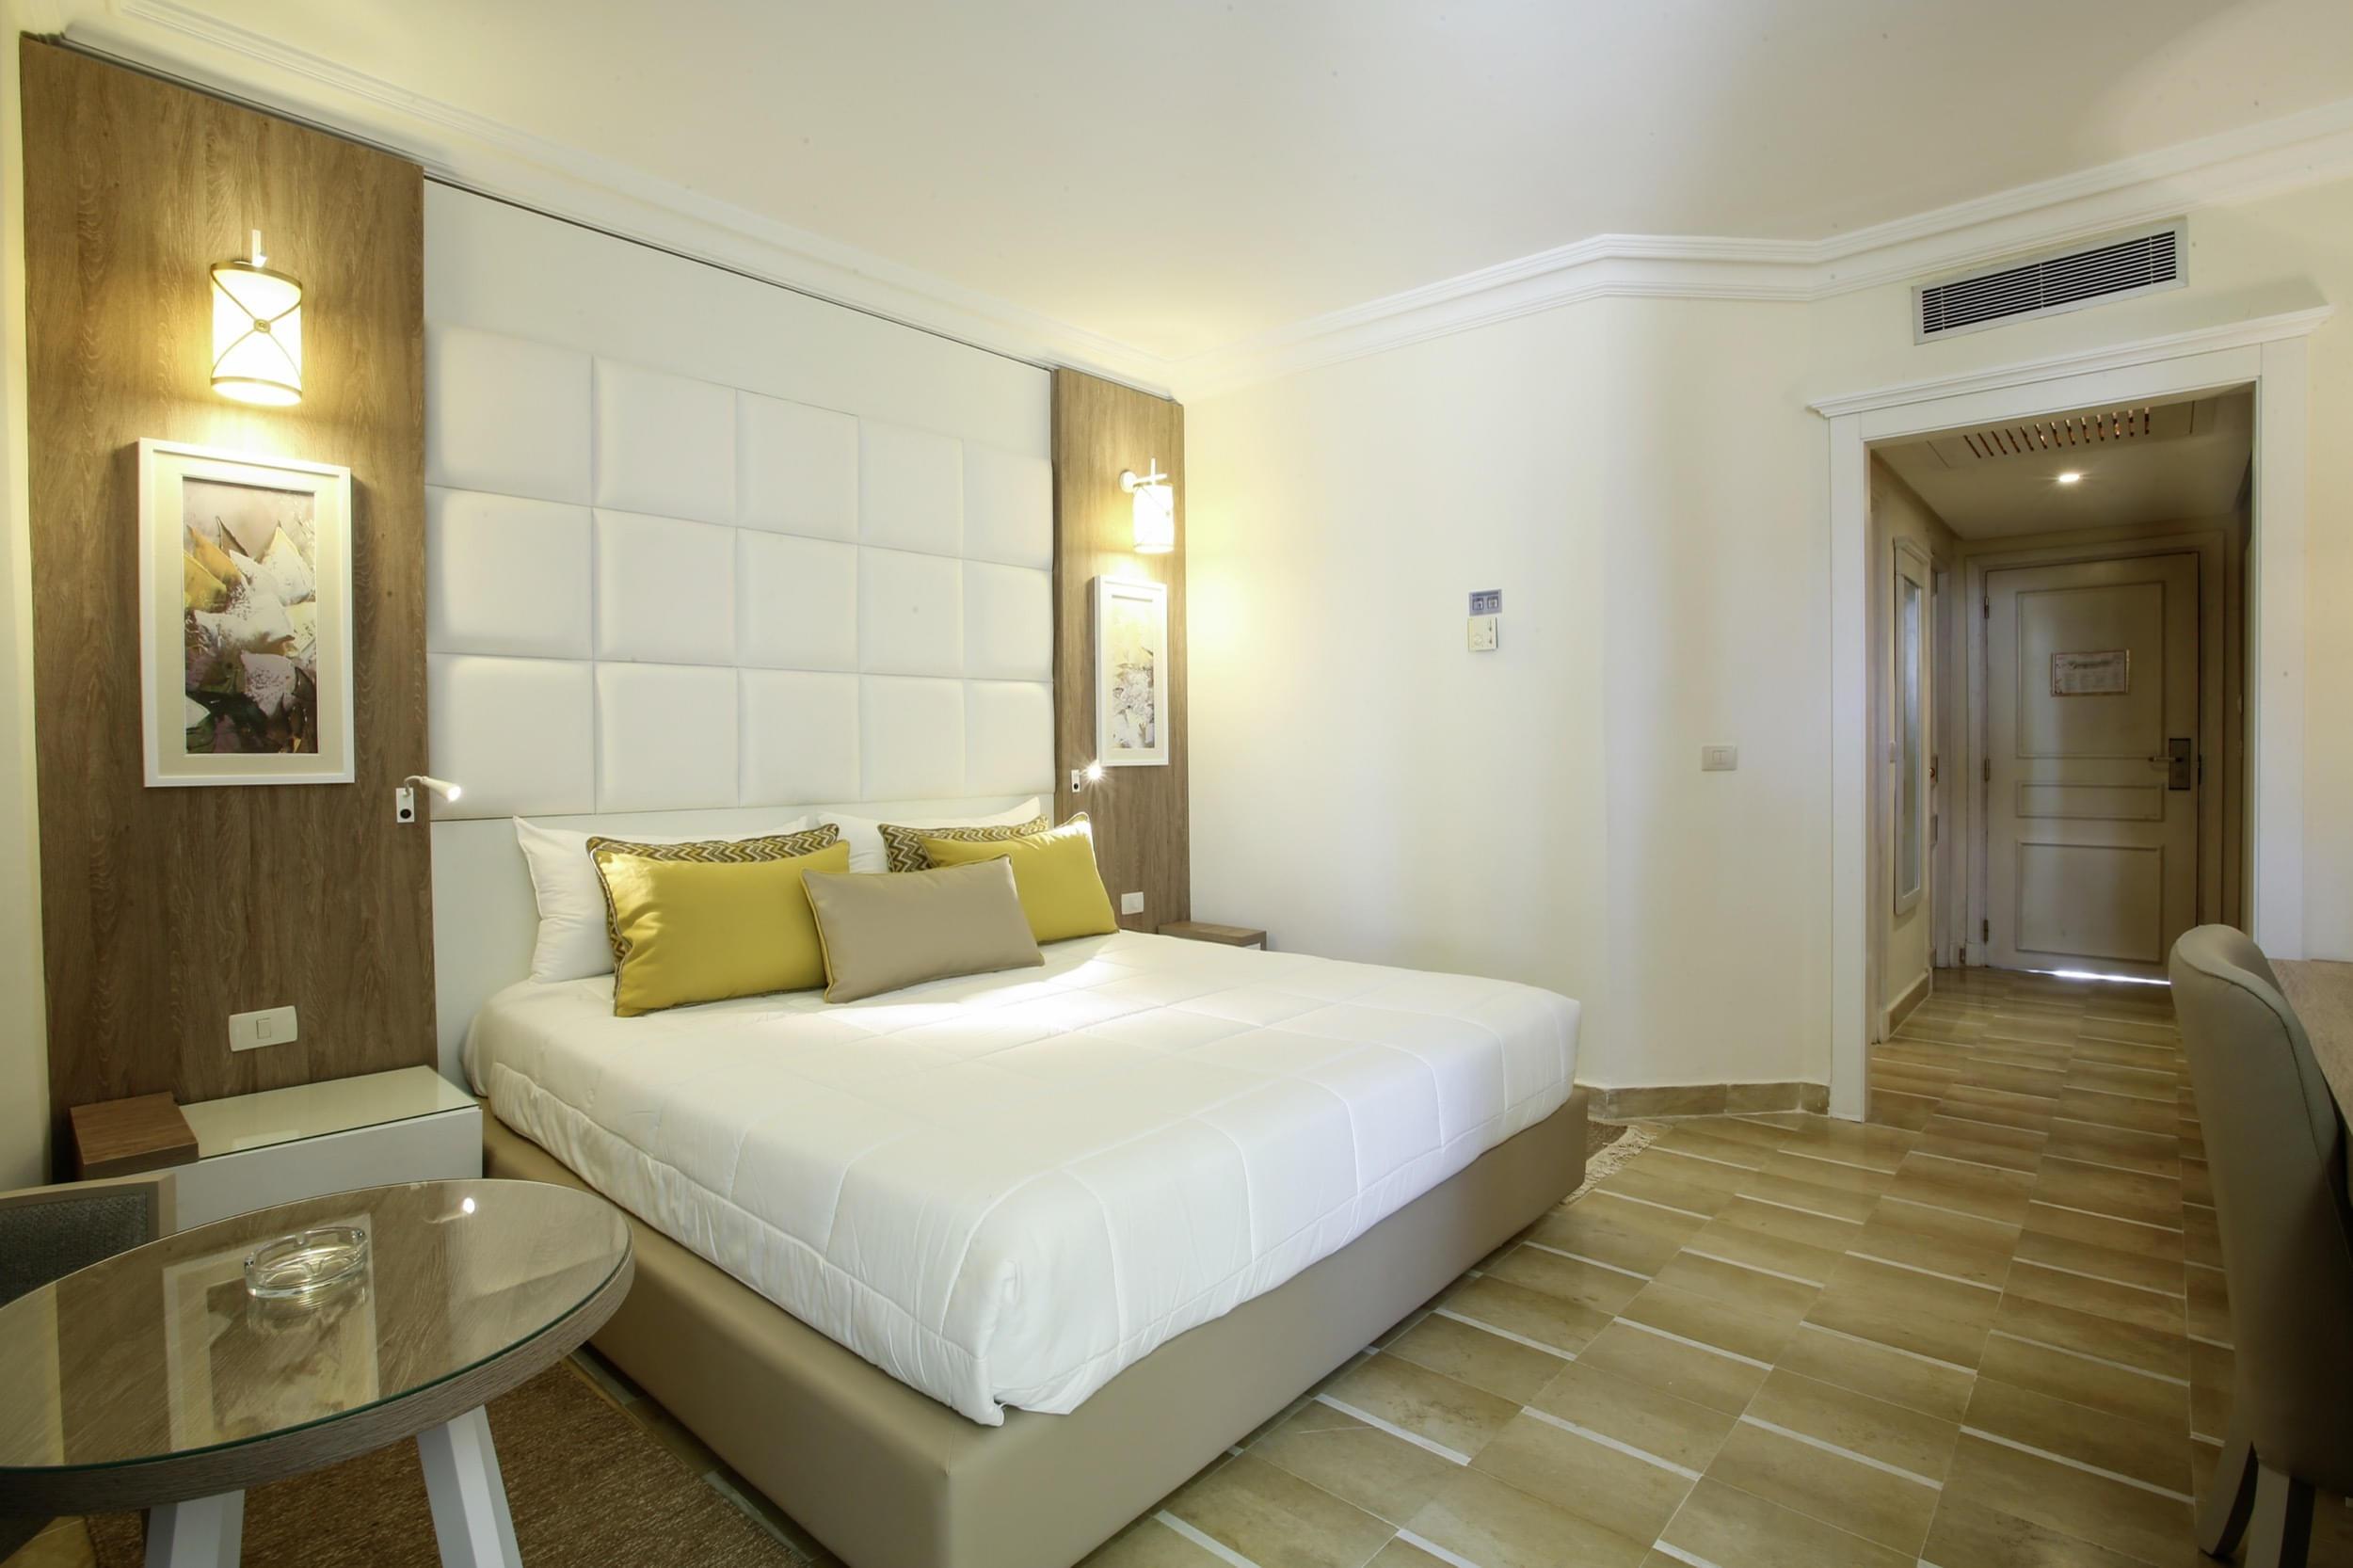 sentido_bellevue_park_double_room